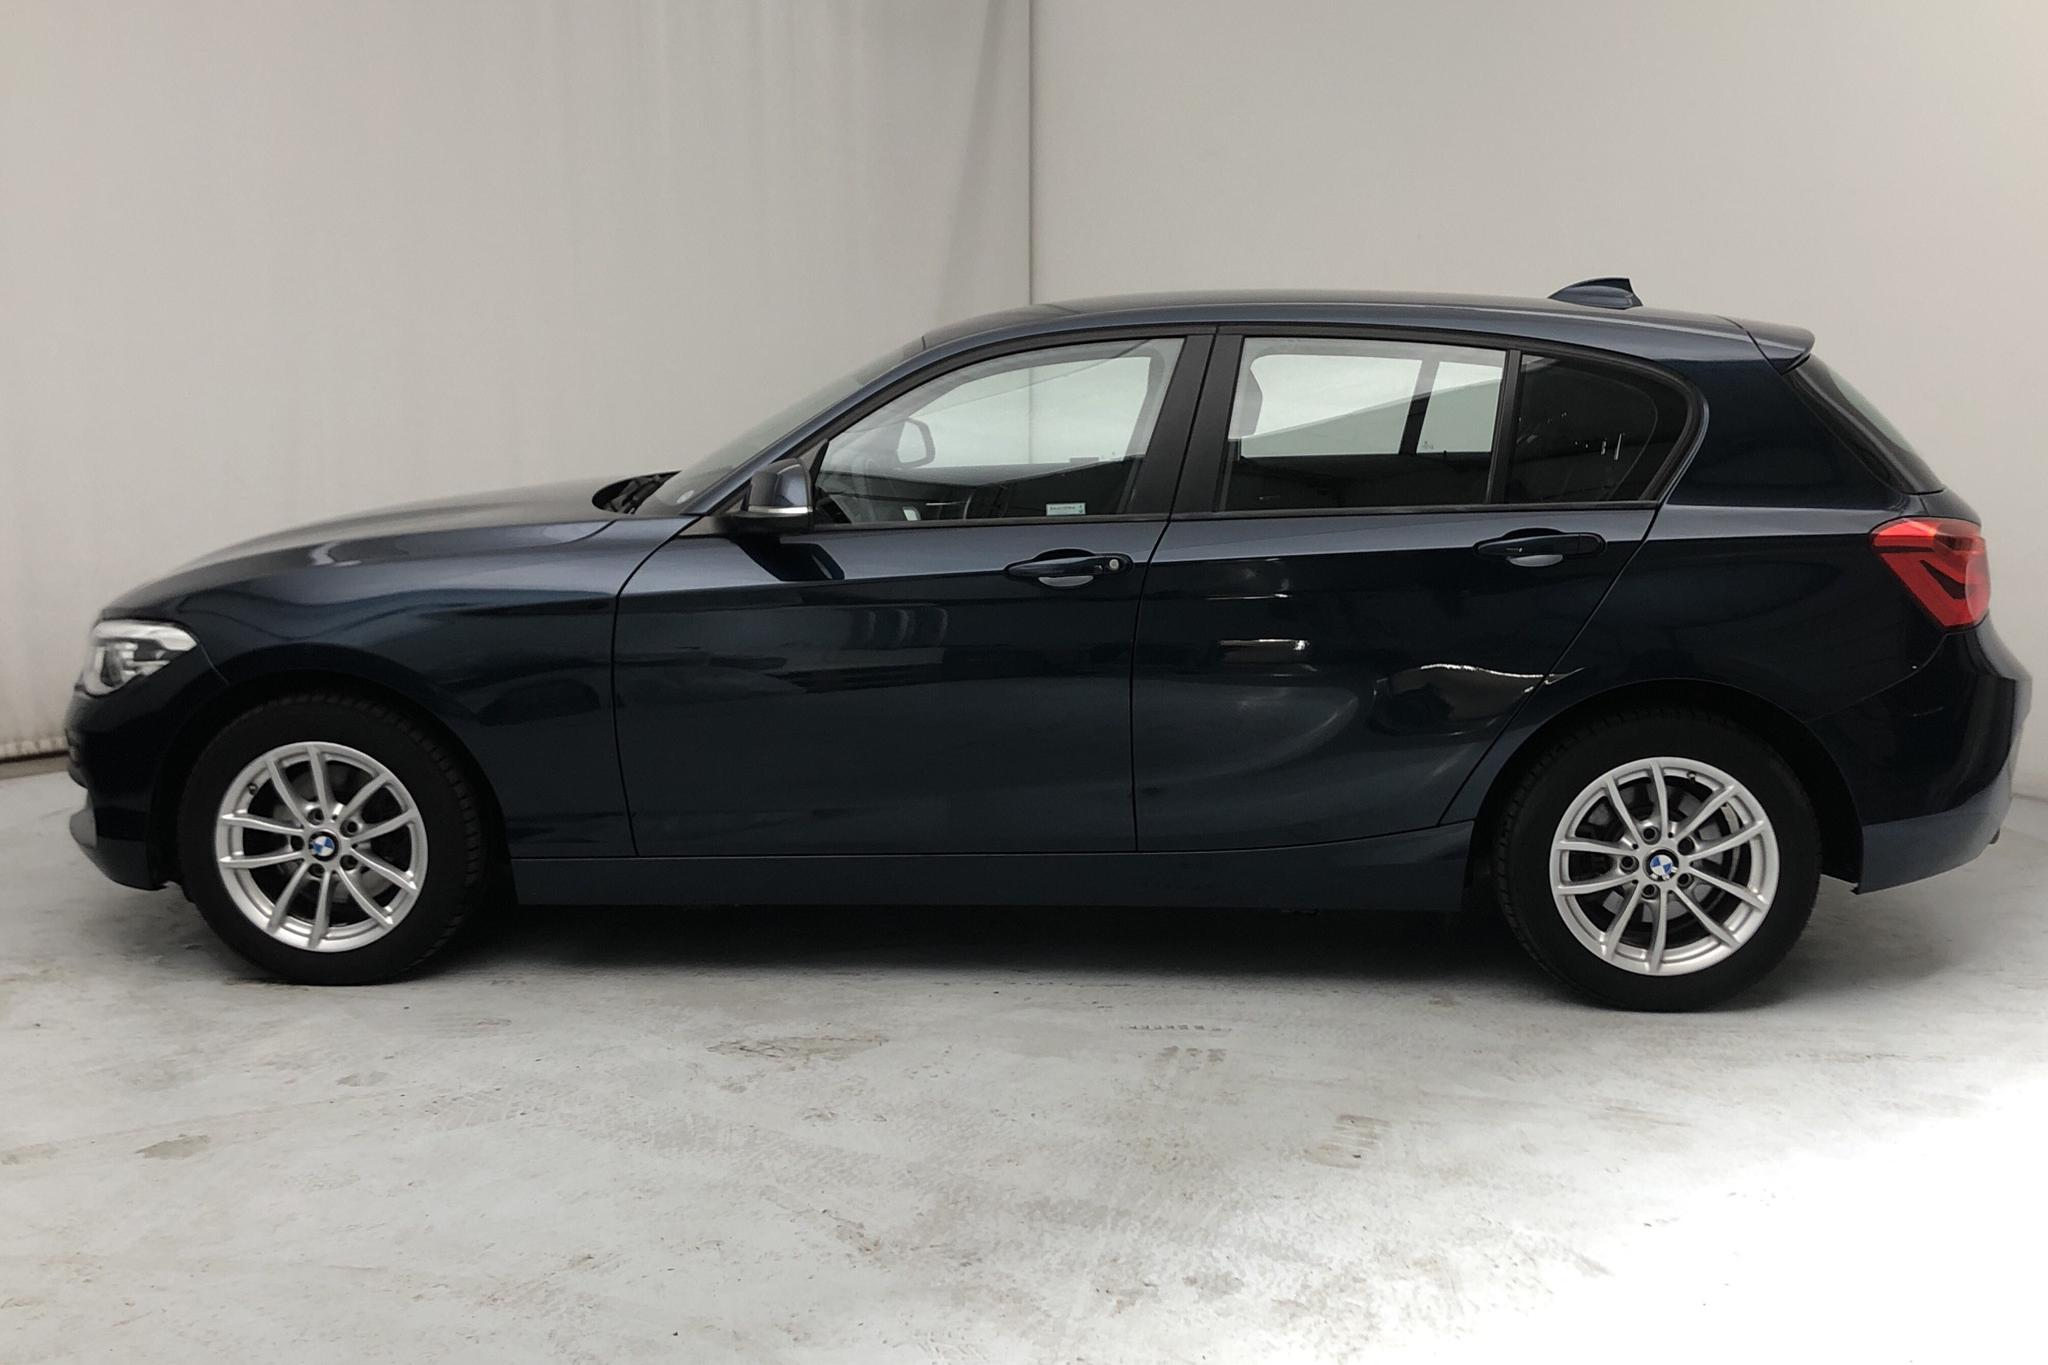 BMW 118d xDrive 5dr, F20 (150hk) - 27 090 km - Manual - blue - 2017